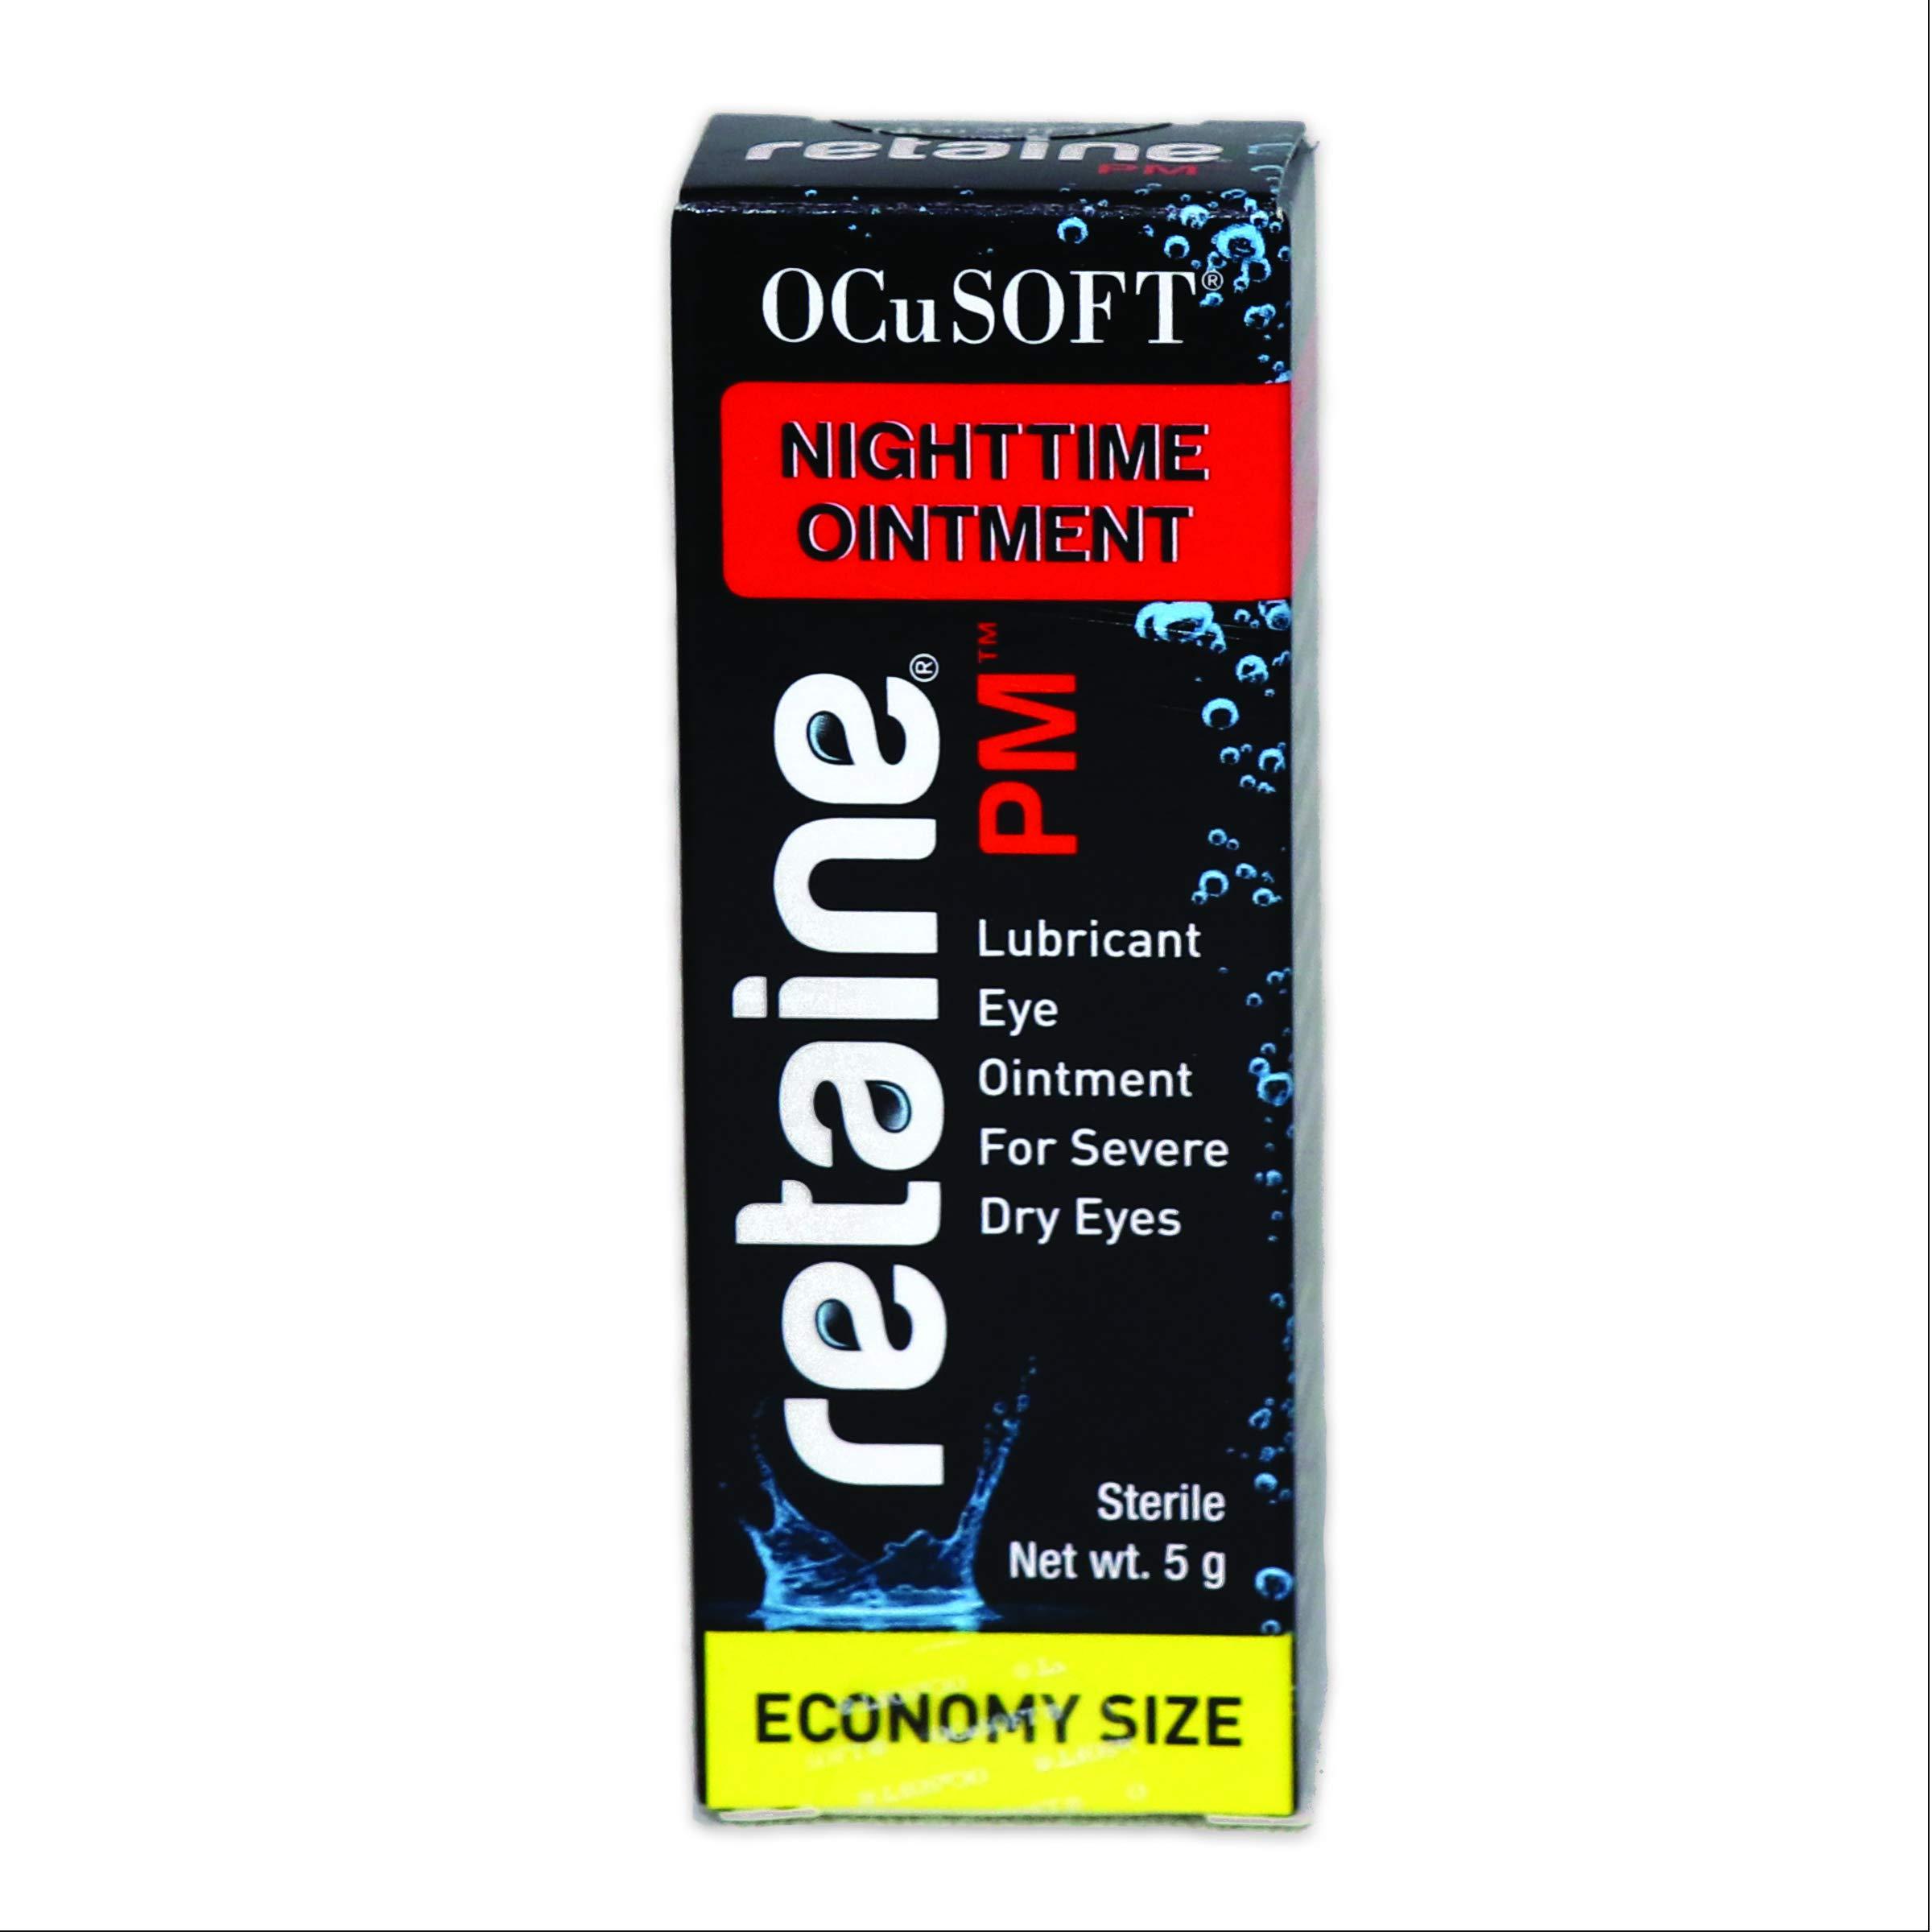 OCuSOFT Retaine Pm 5g Tube, Black Box W/Red Banner, 5gm